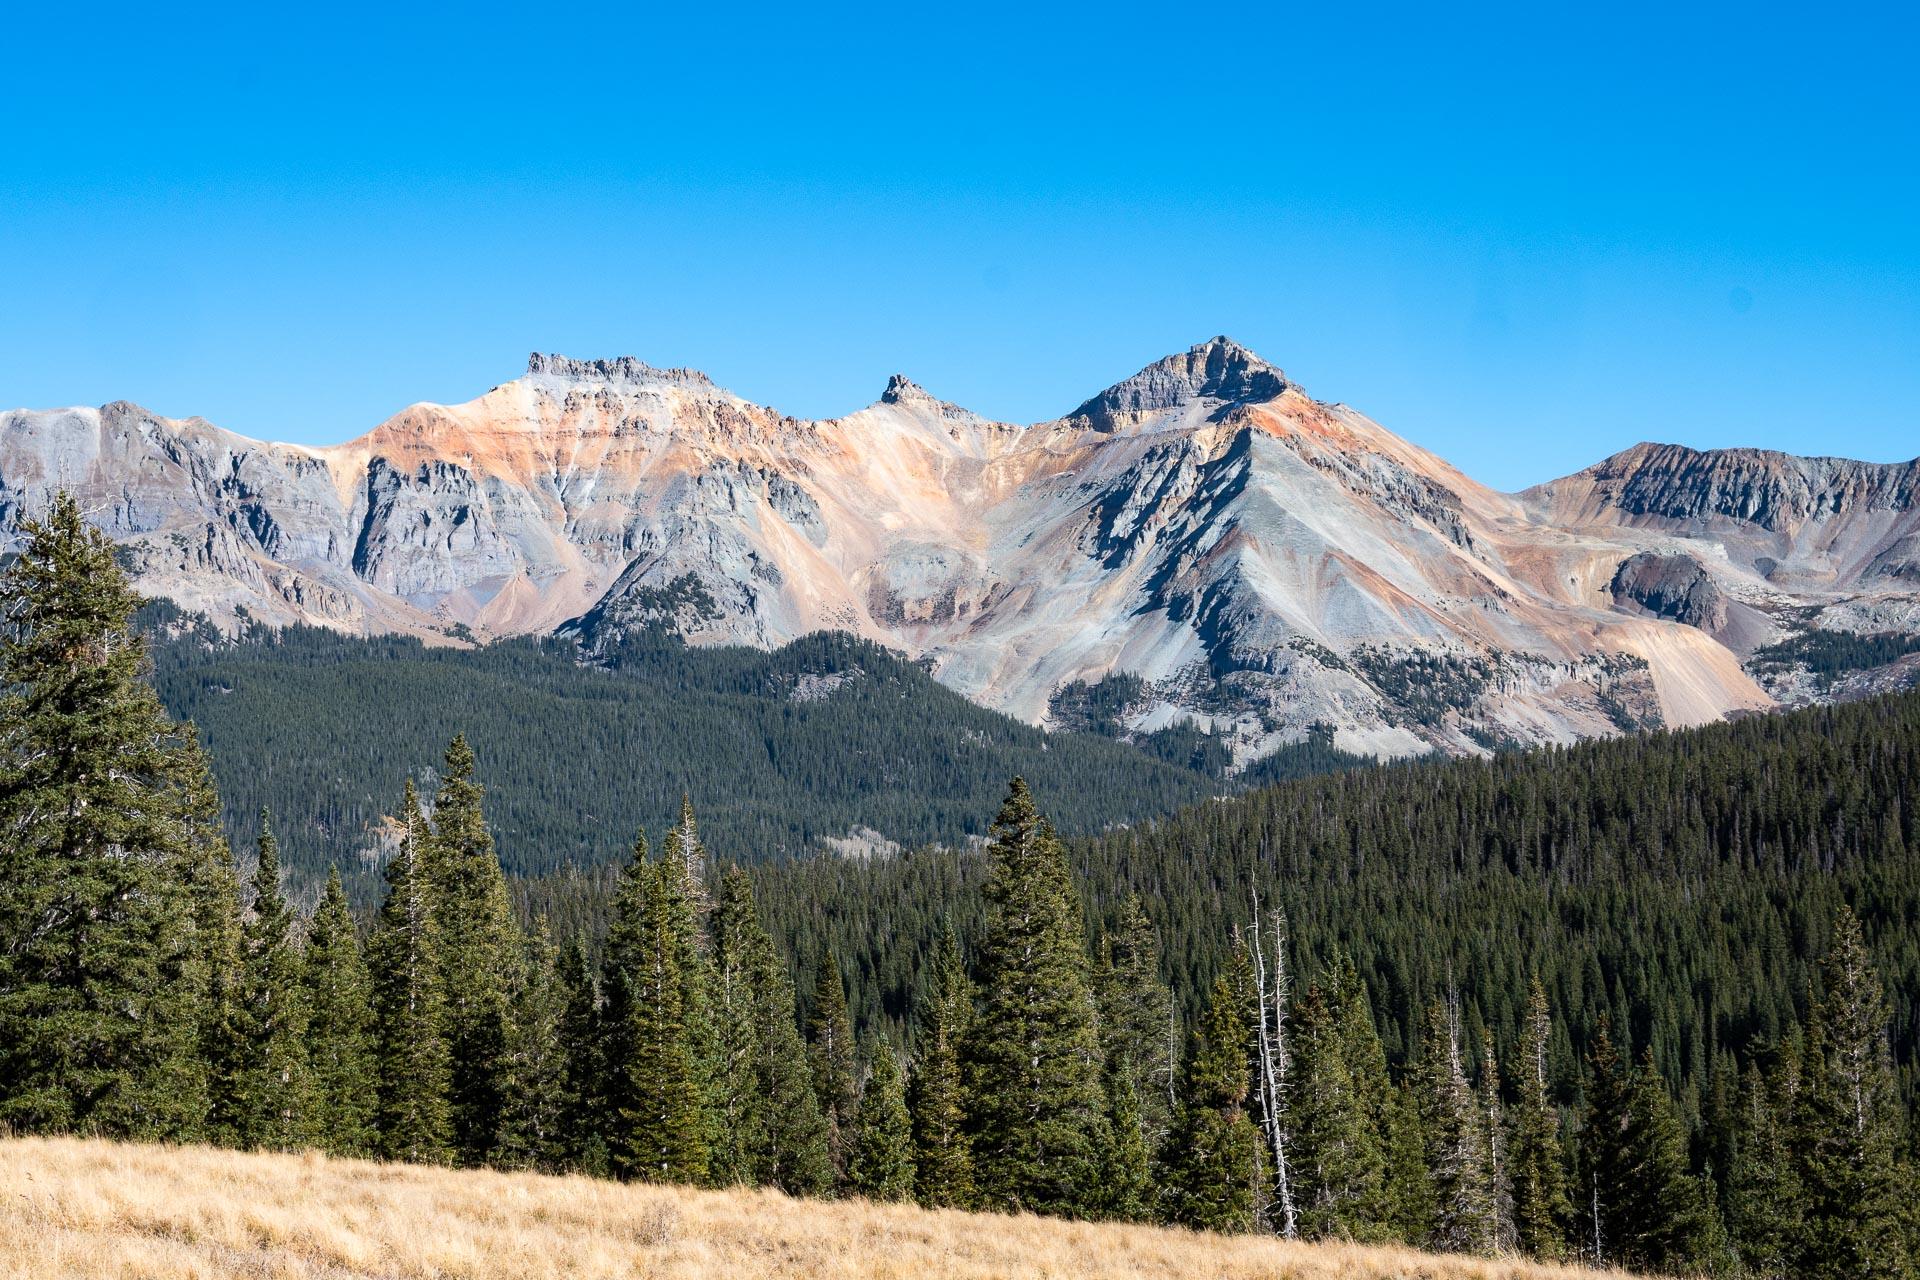 Pilot Knob, Golden Horn, Vermillion Peak